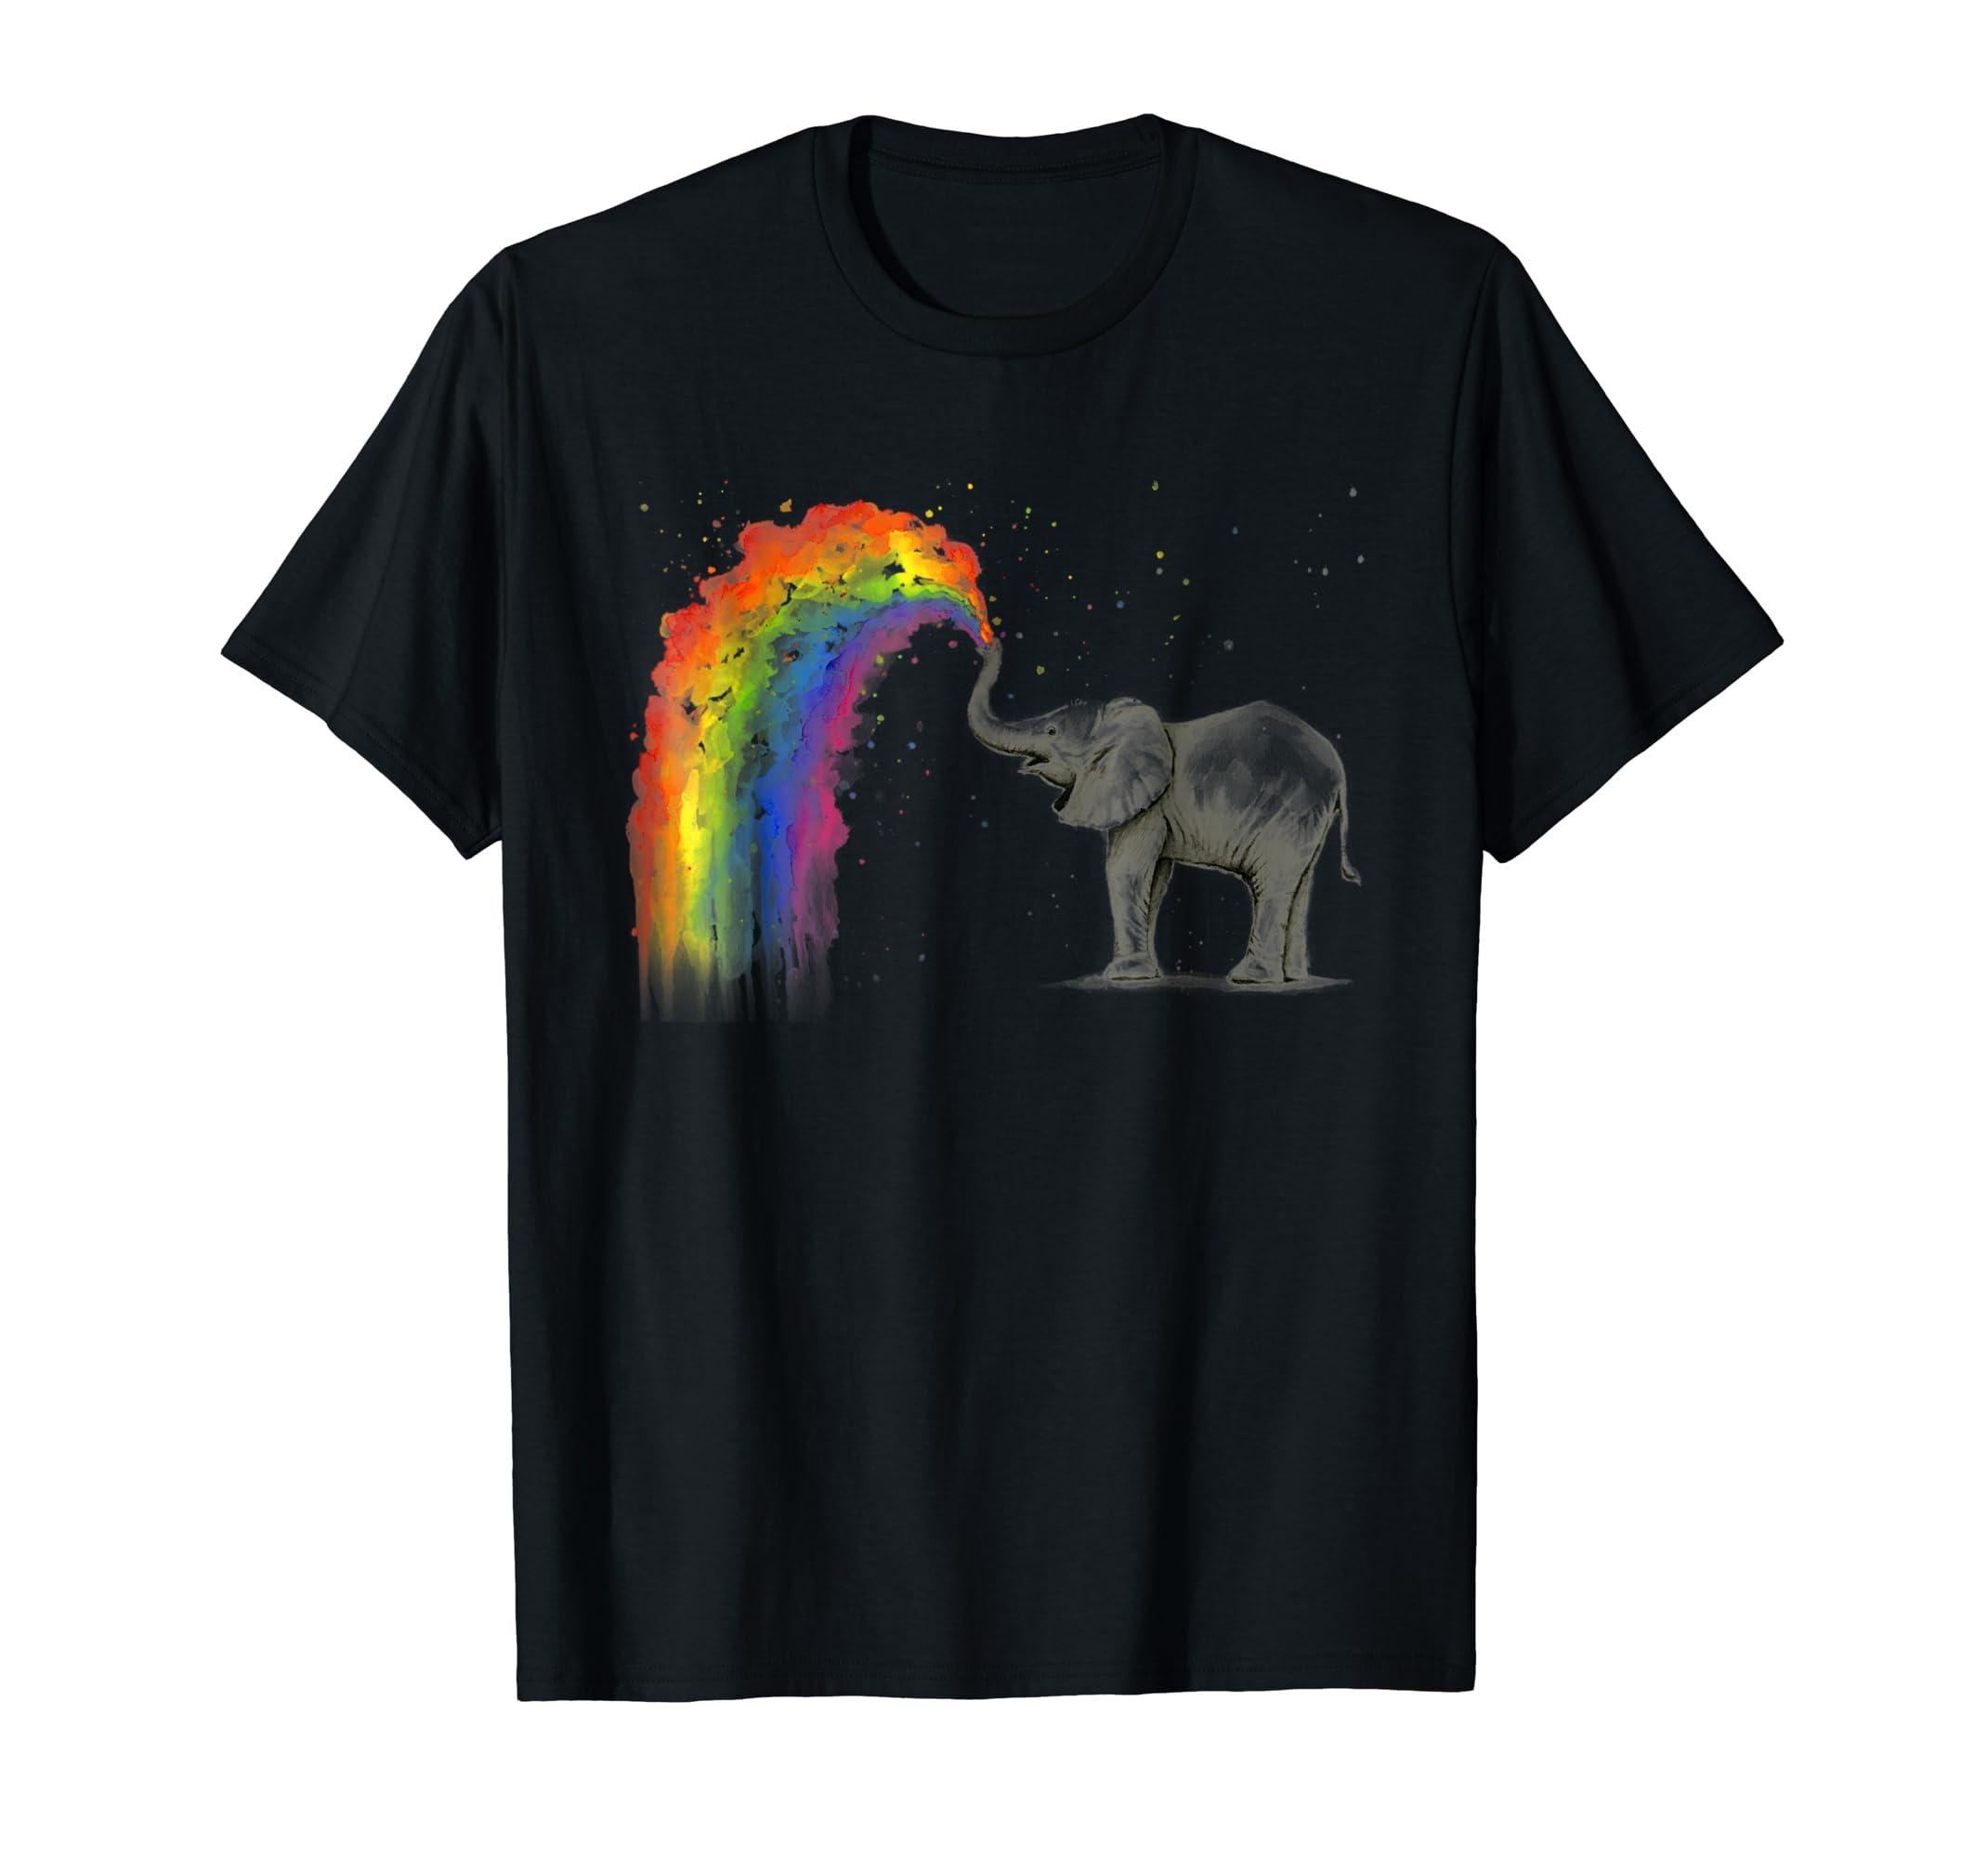 Elephant Spraying Rainbow T-shirt Baby Elephant Watercolor-Men's T-Shirt-Black